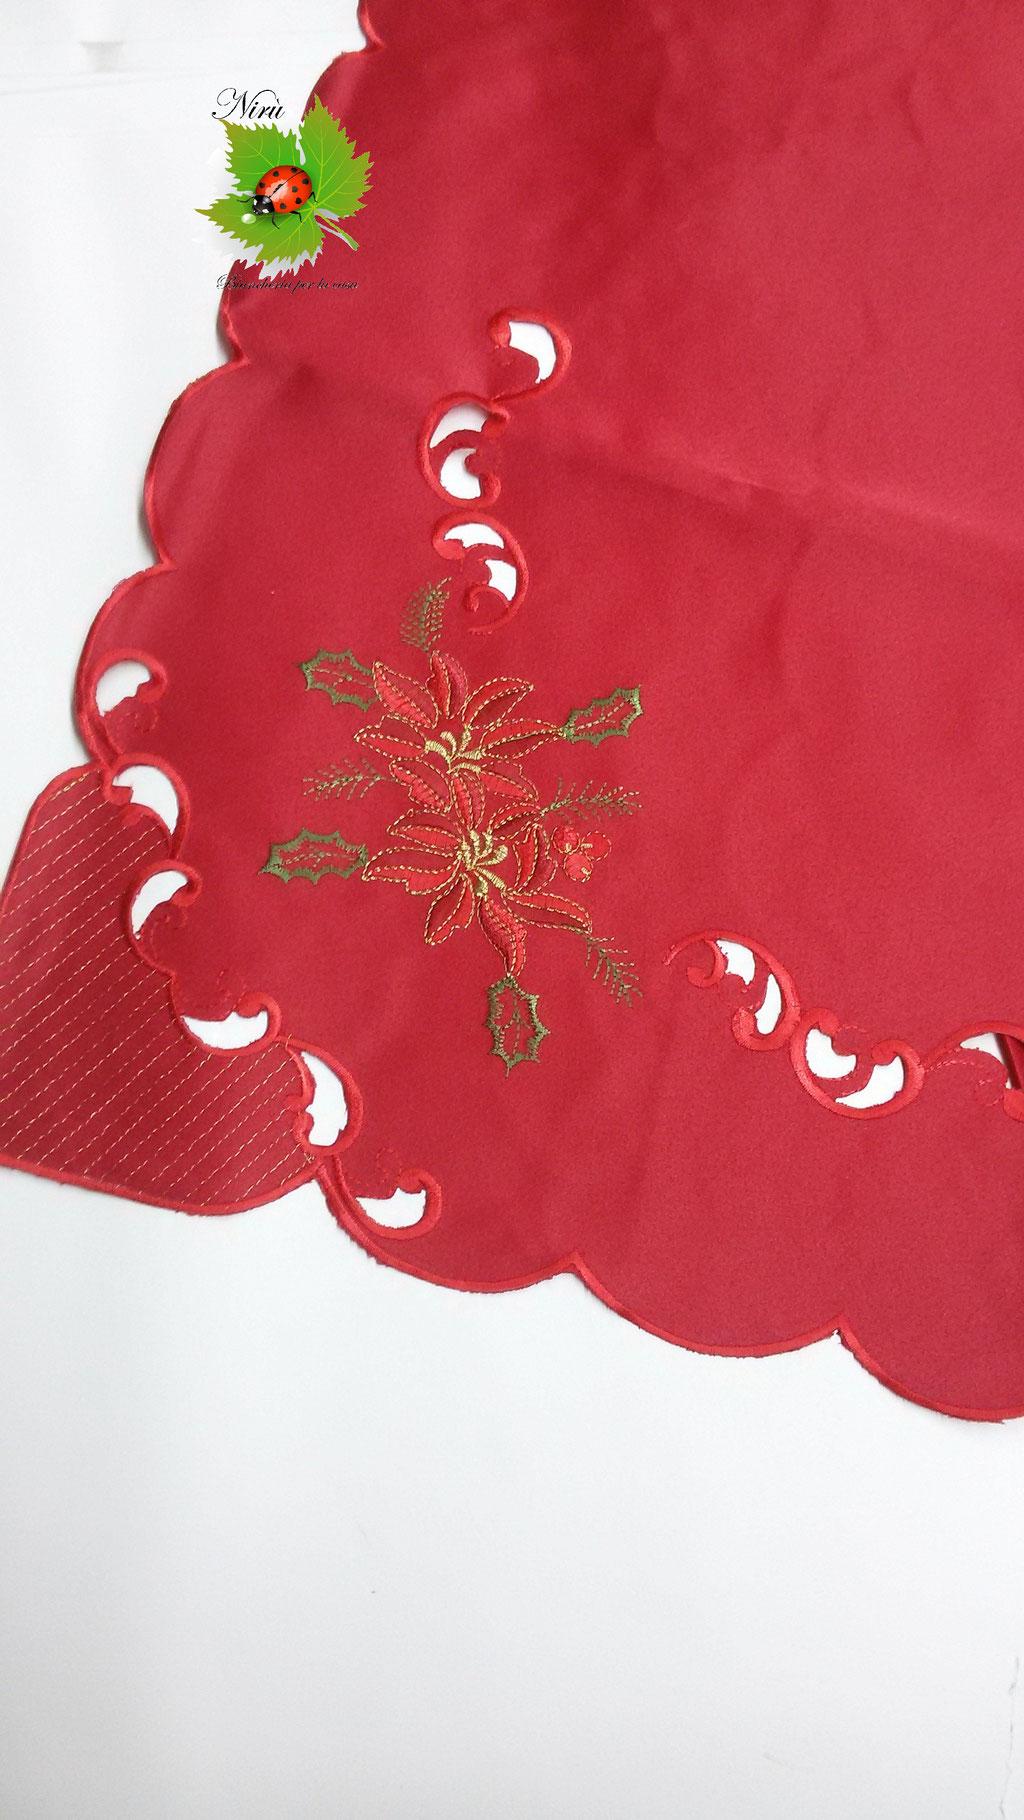 Copritavola tovaglia natalizia da 12 posti 140x240 cm. B108